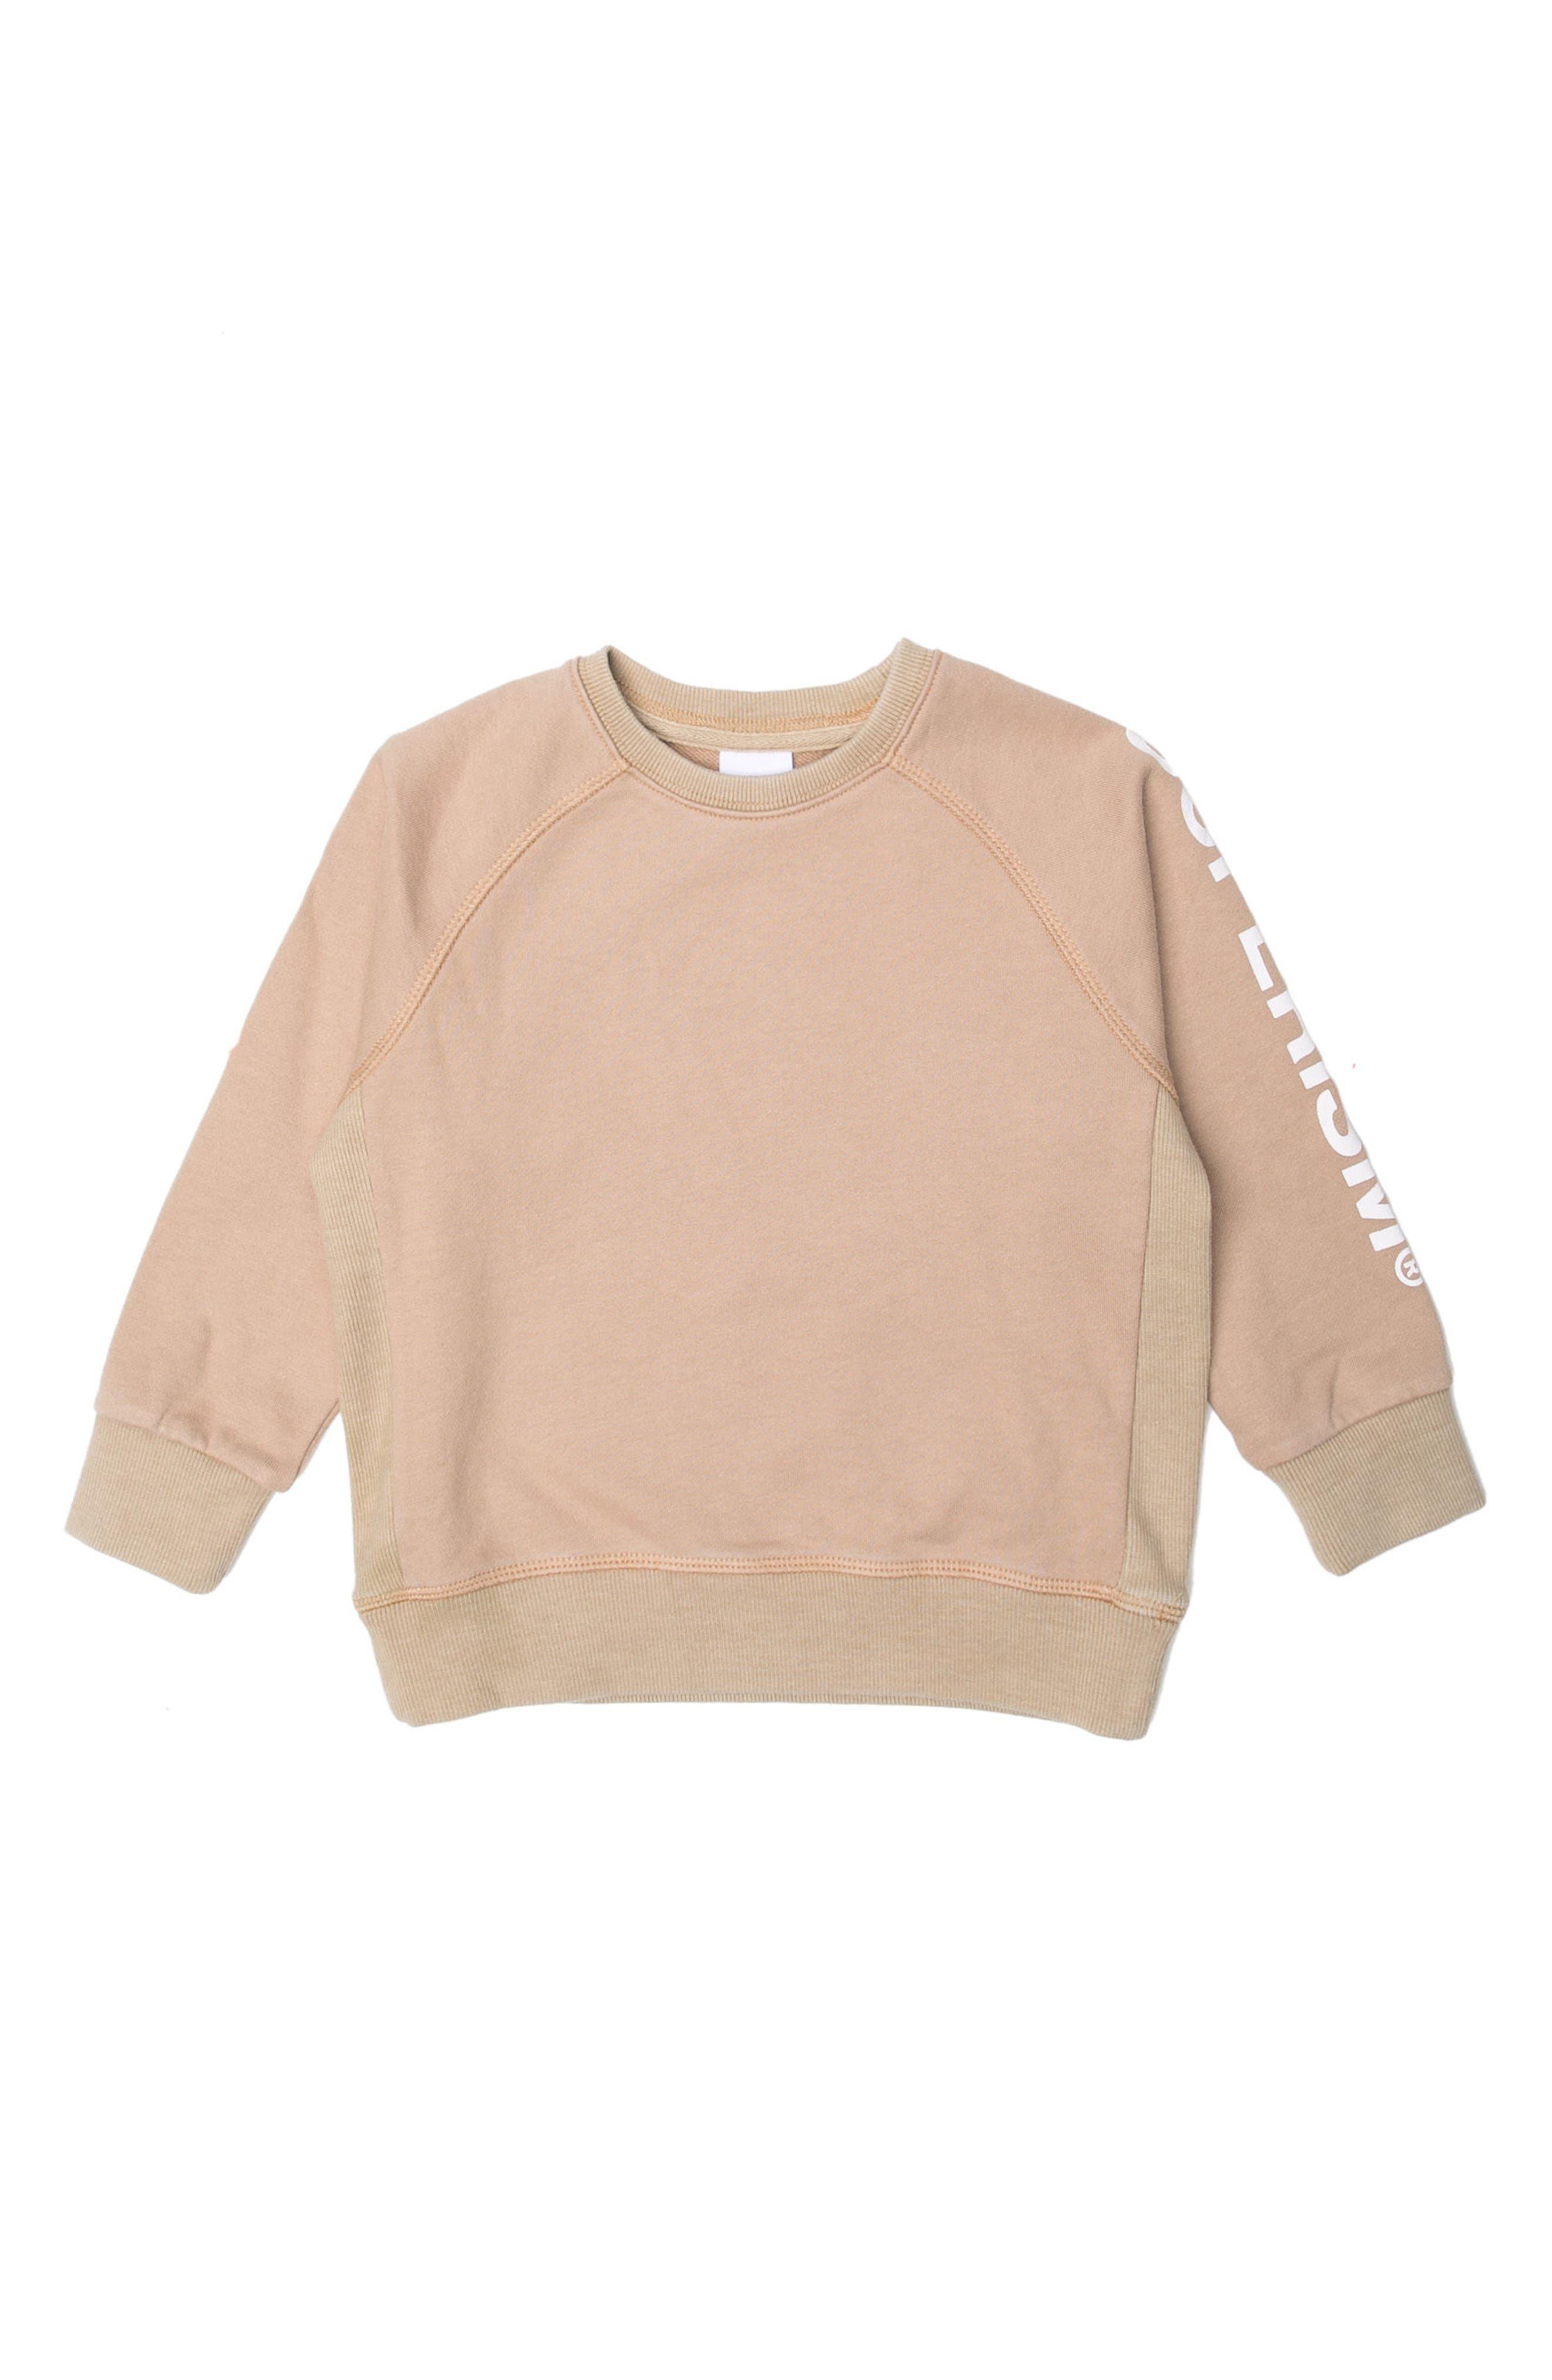 Andy Fleece Sweatshirt,                         Main,                         color, SAND